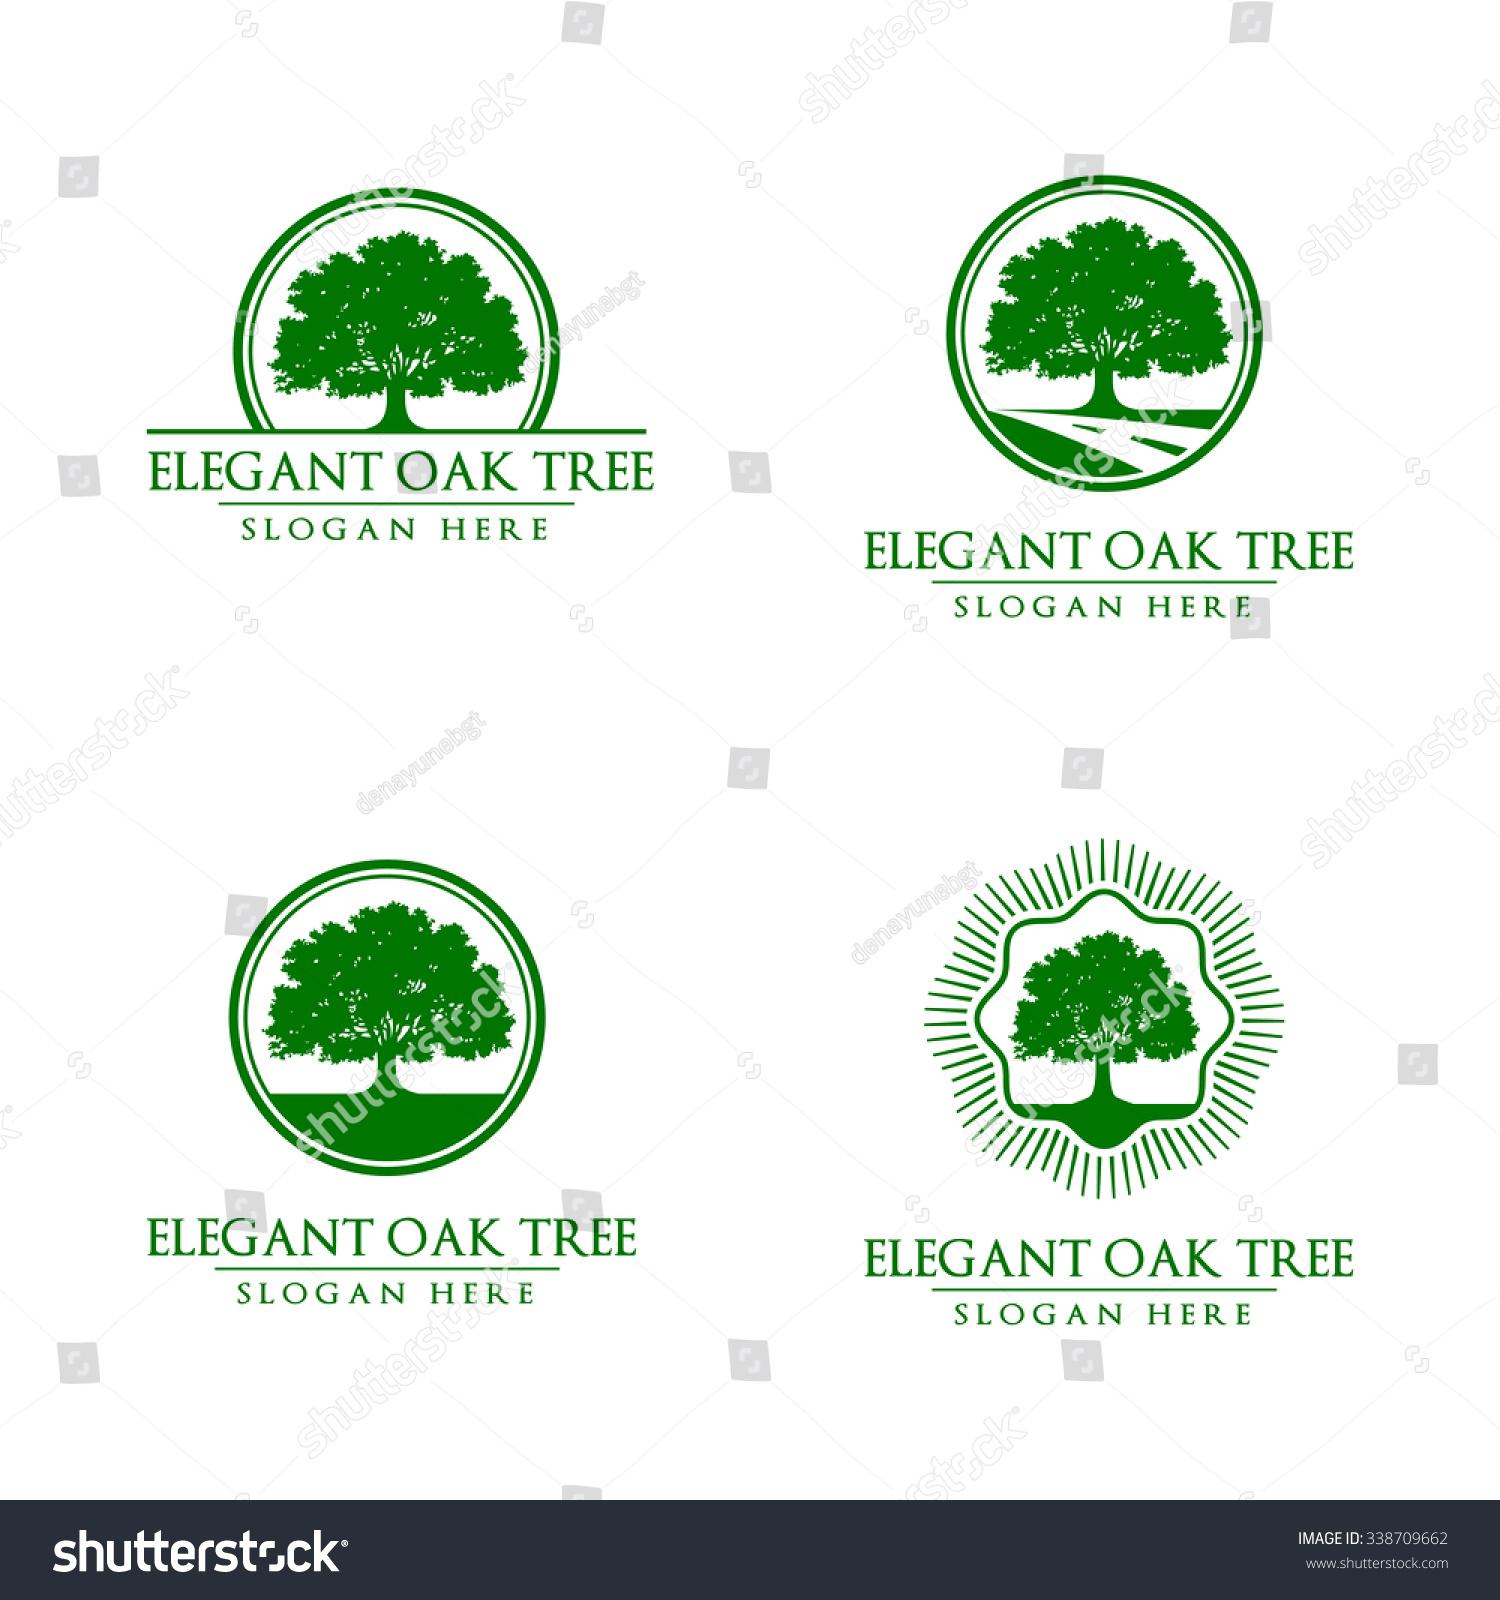 Green Oak Tree Logo Vol 3 Stock Vector 338709662 - Shutterstock